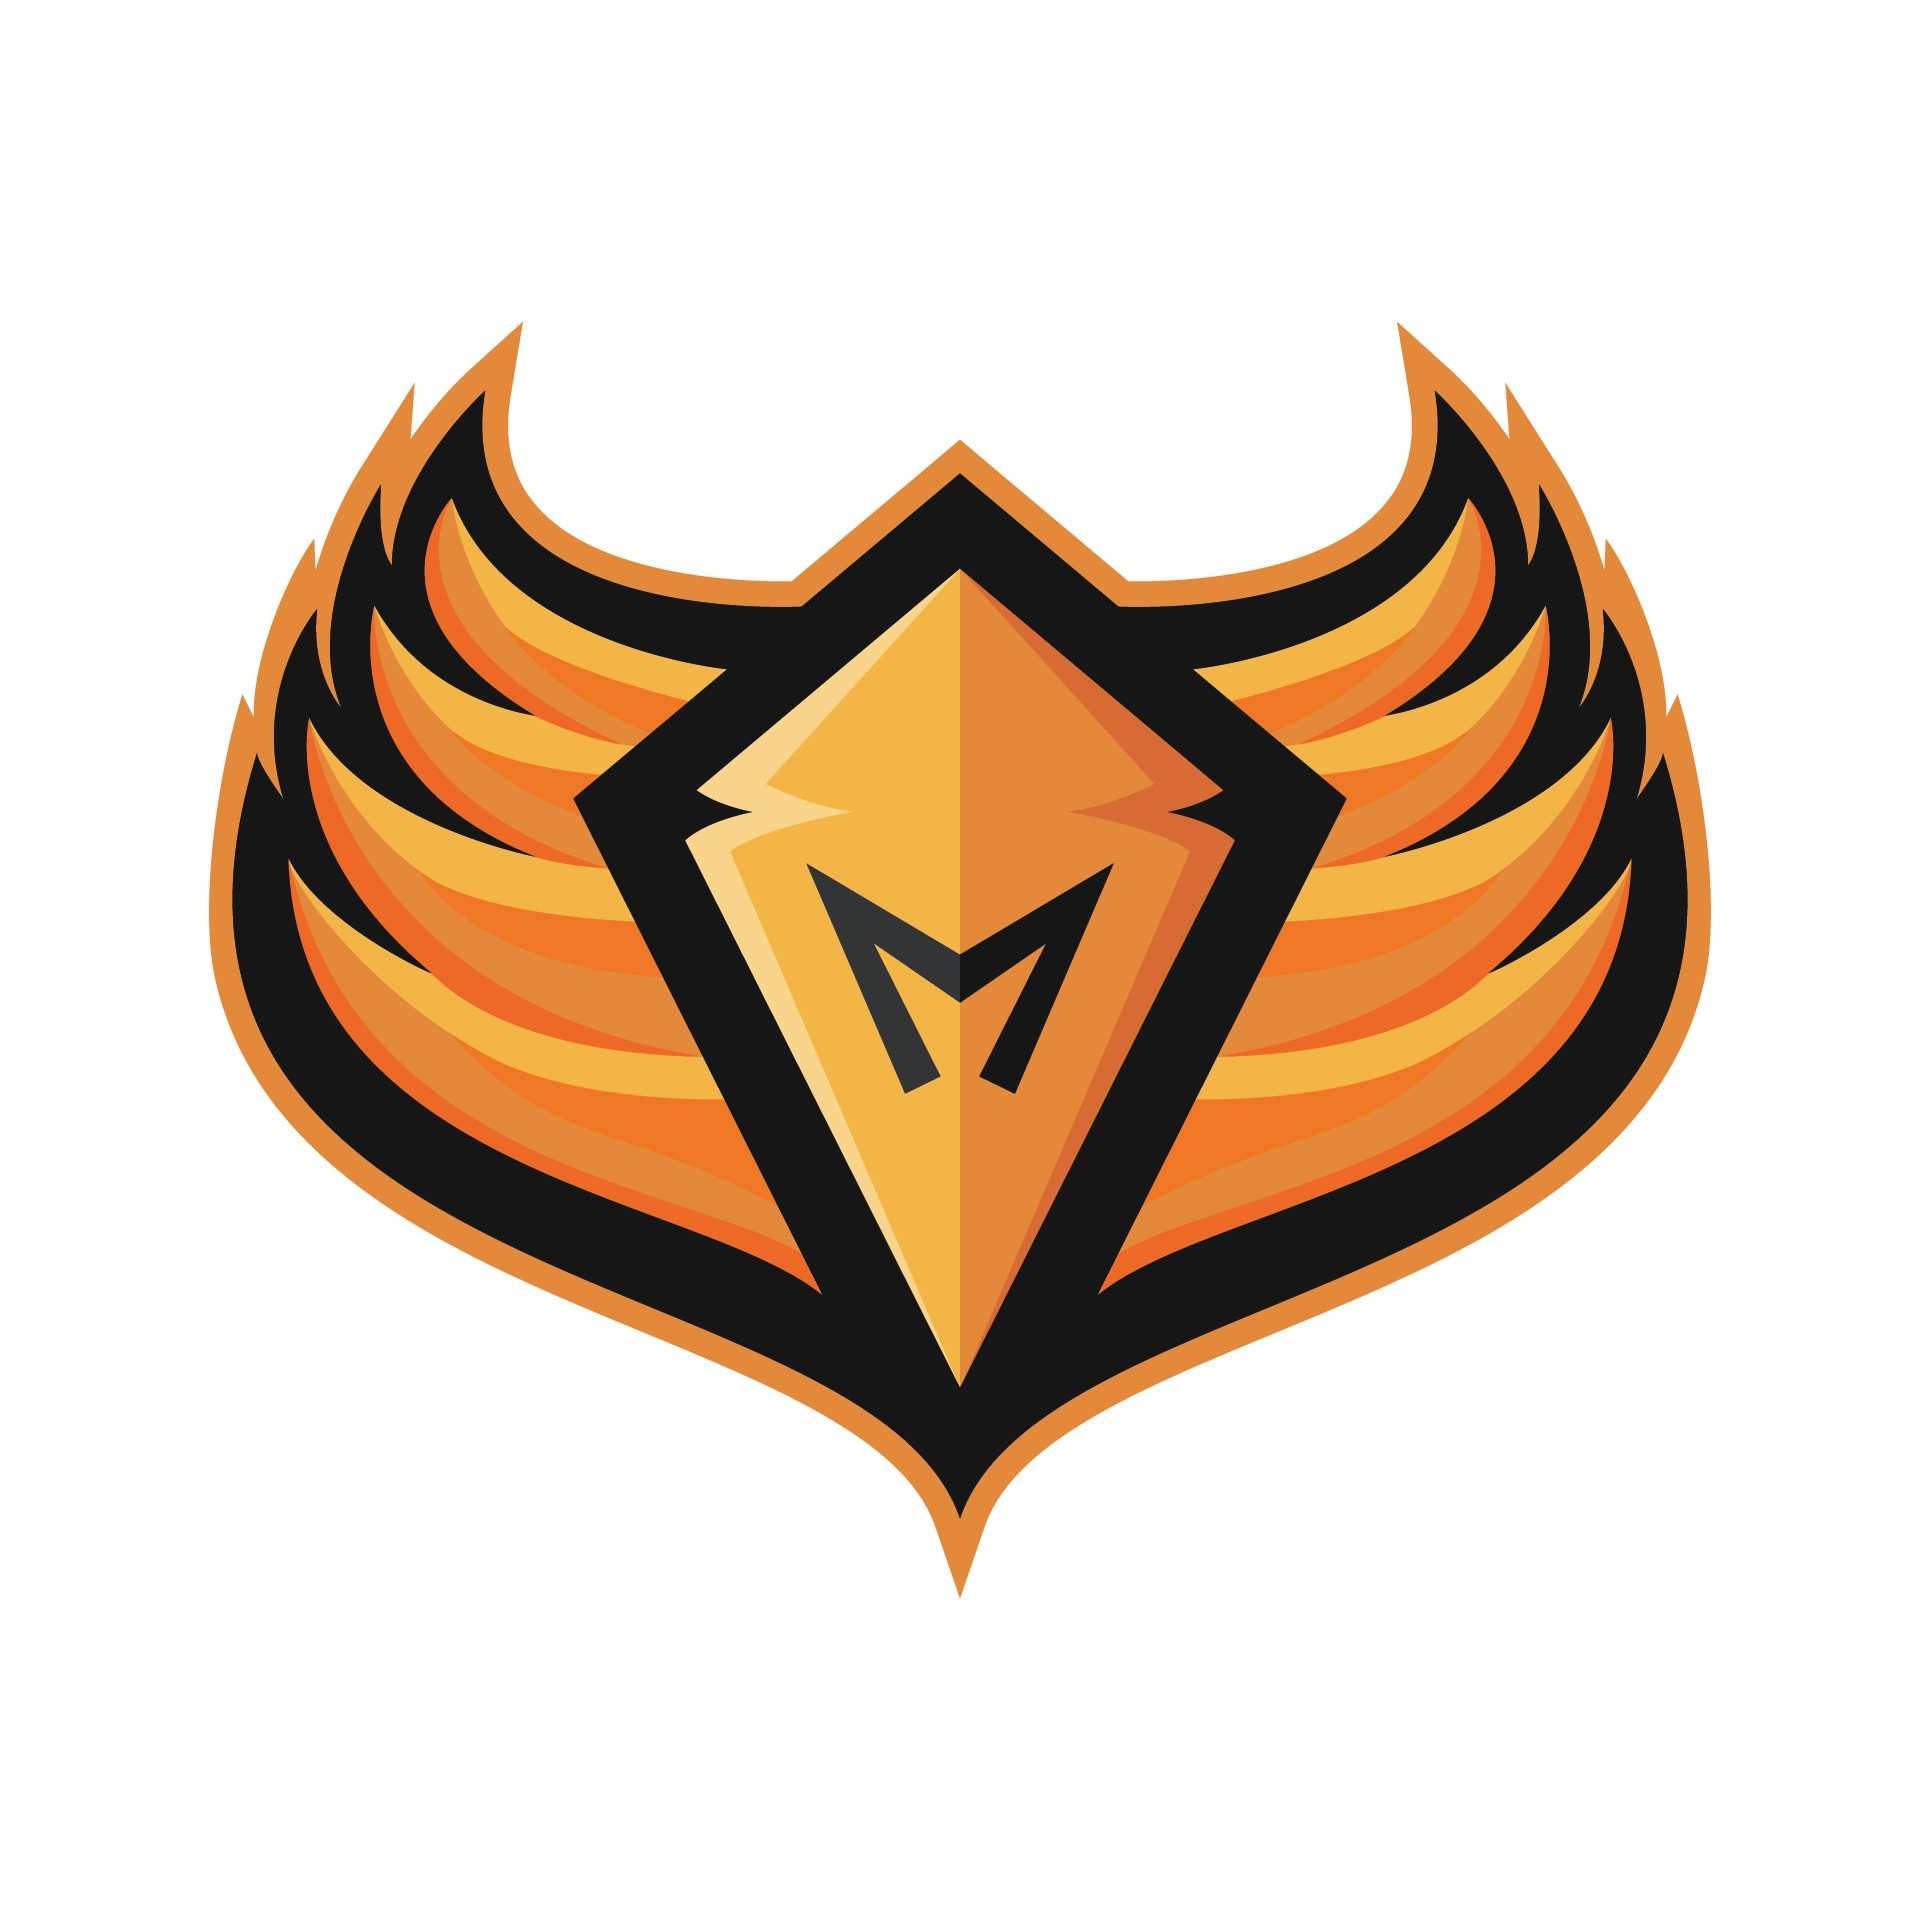 Monarch Esports's logo